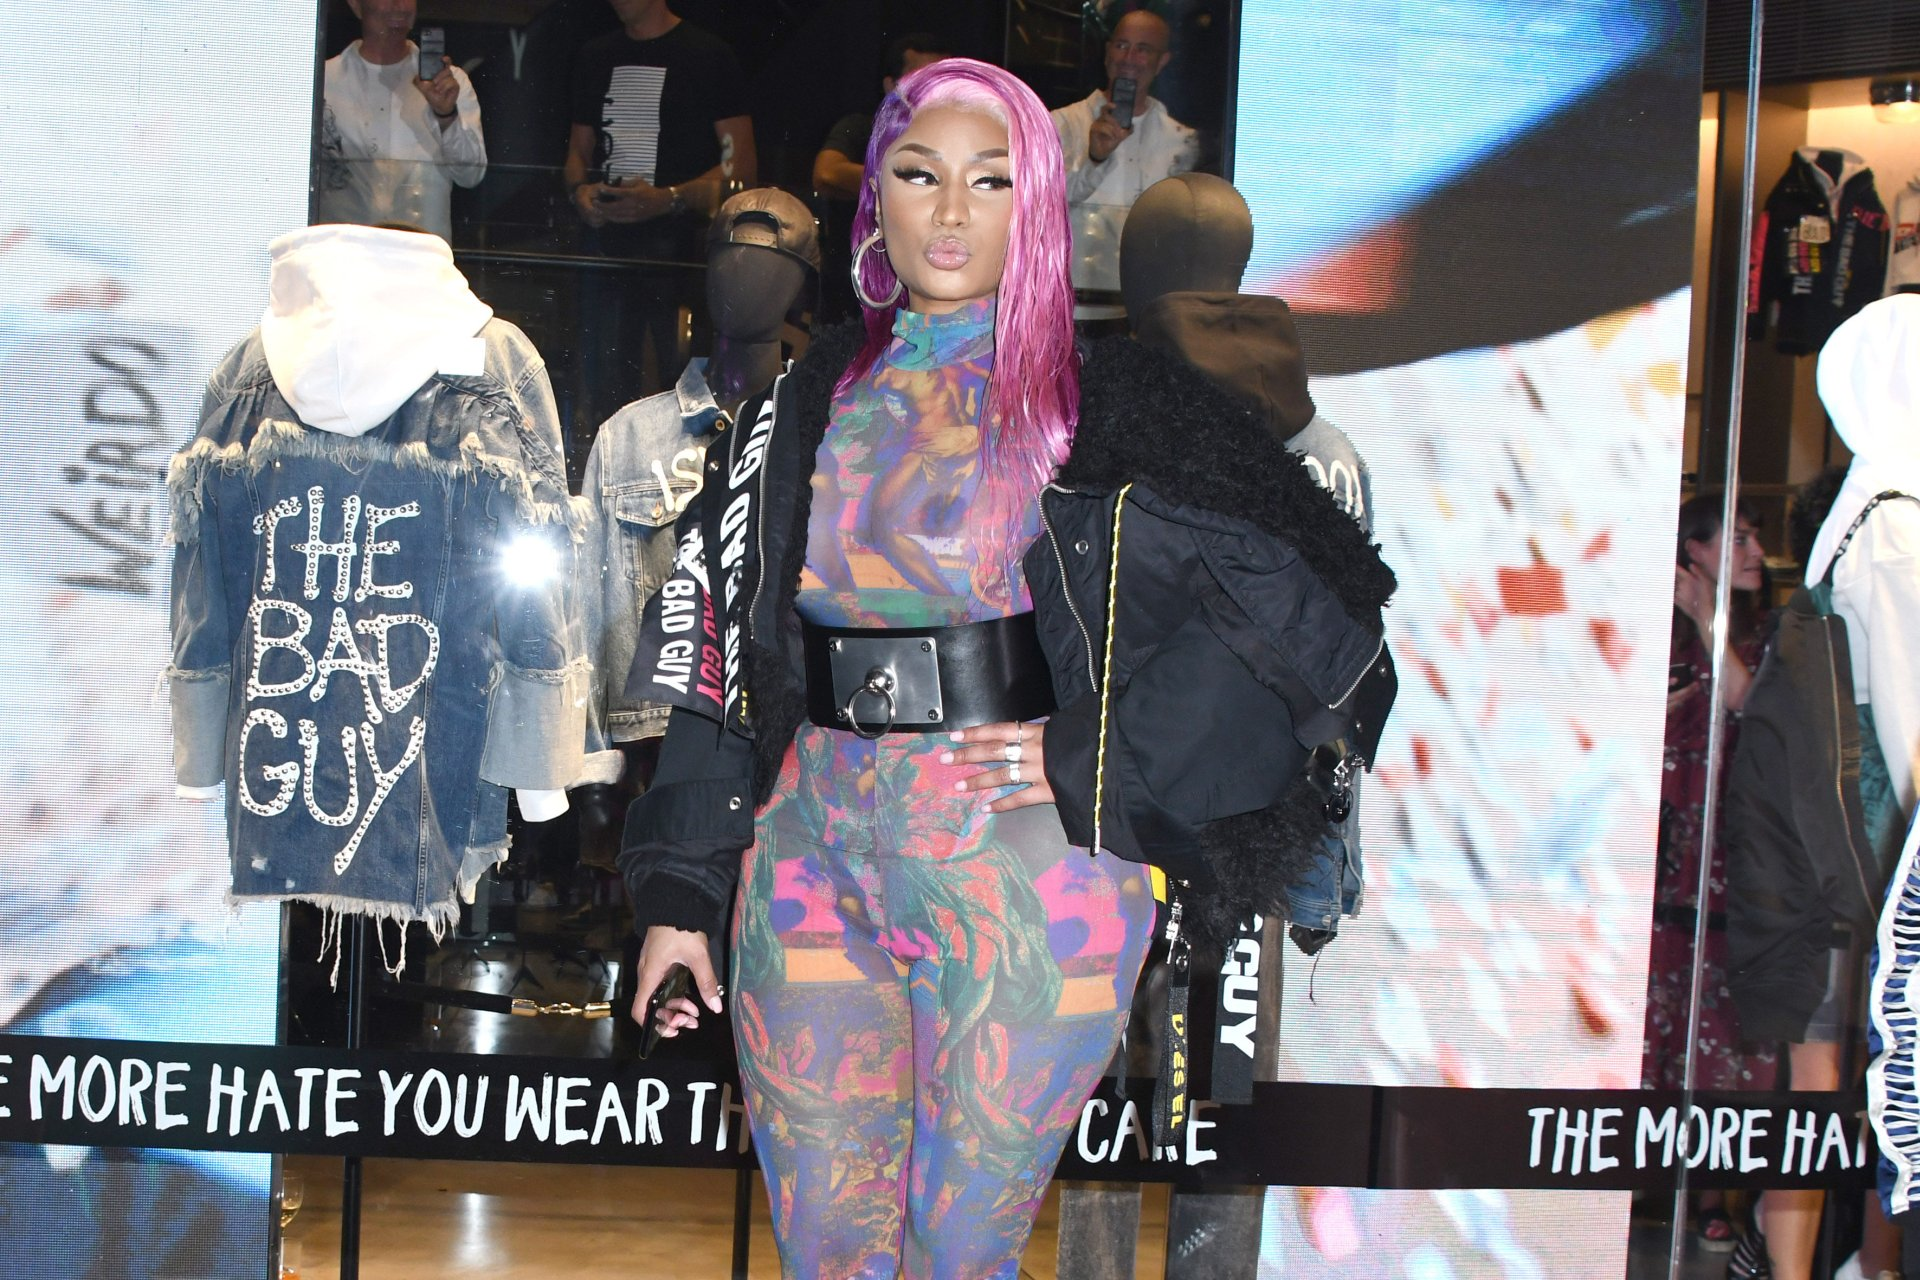 Nicki-Minaj-See-Through-TheFappeningBlog.com-36.jpg